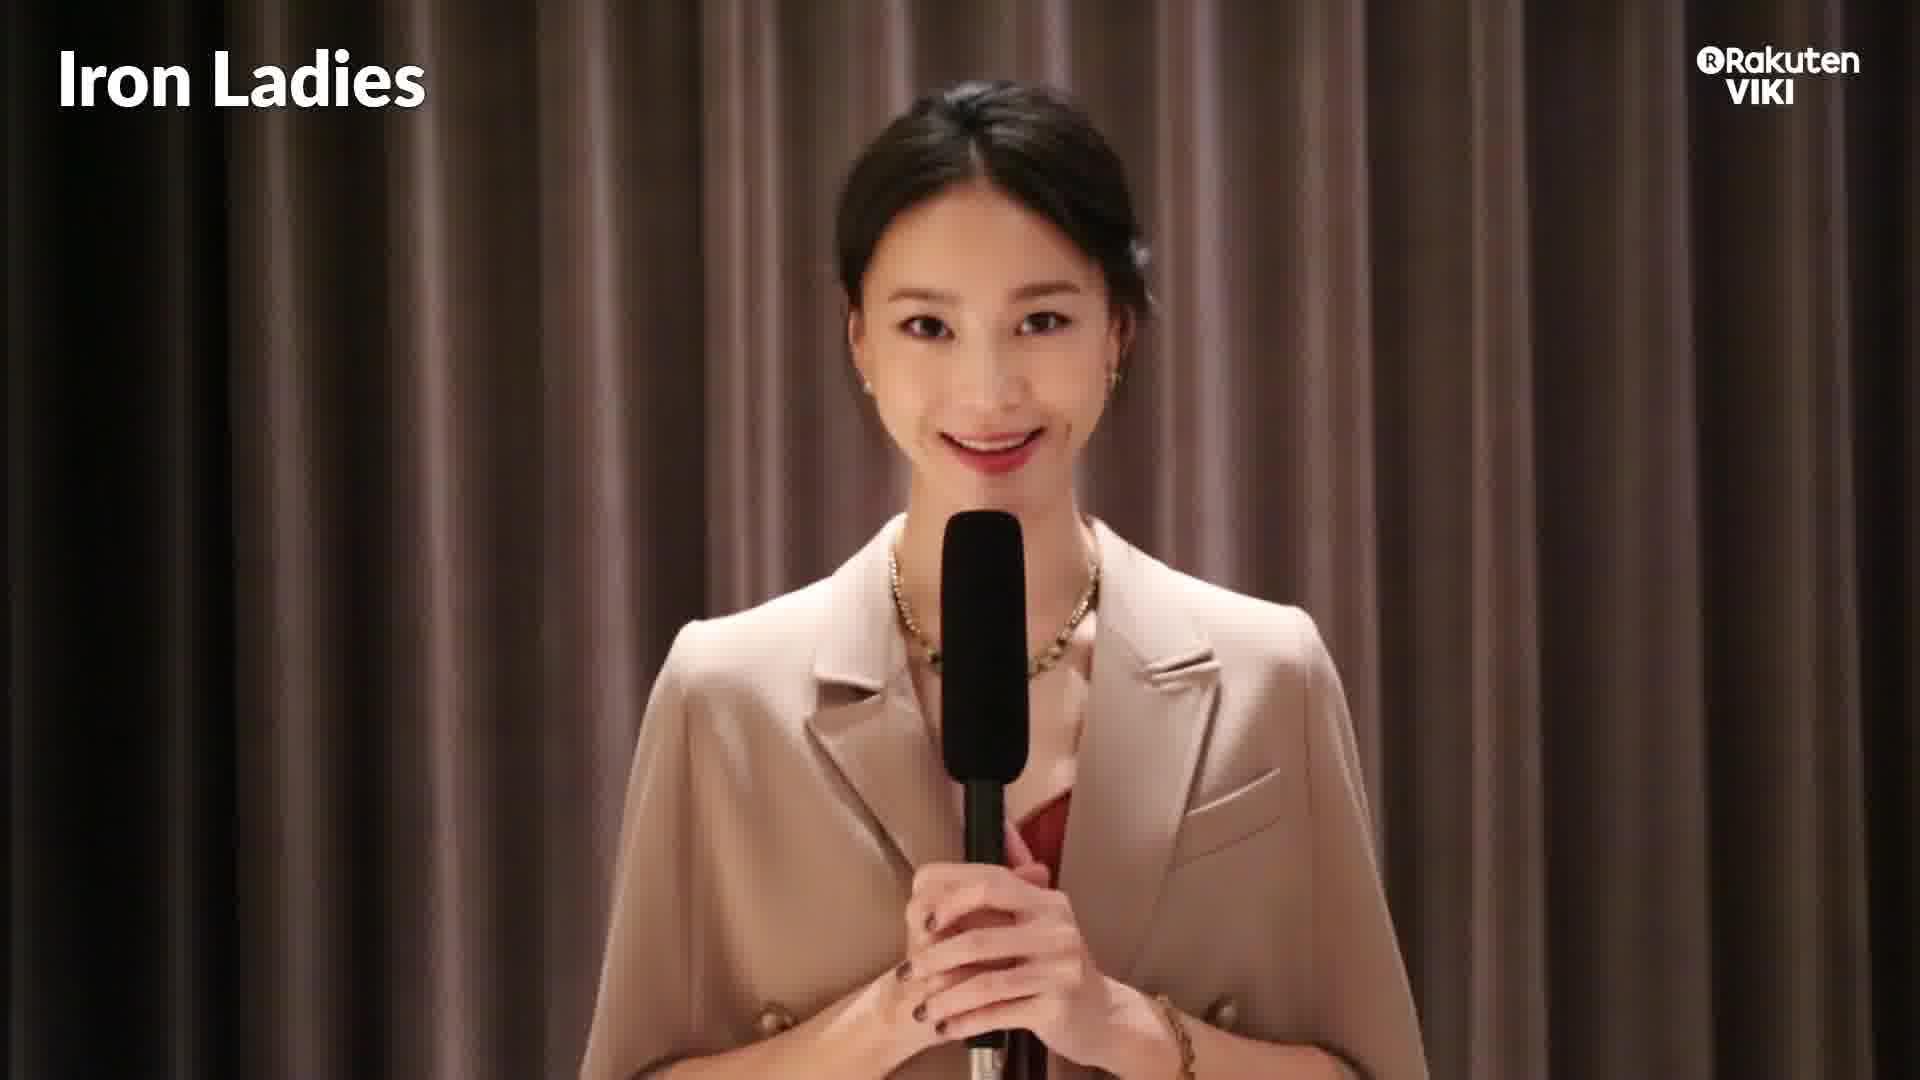 Aviis Zhong's Shoutout to Viki Fans: Les dames de fer